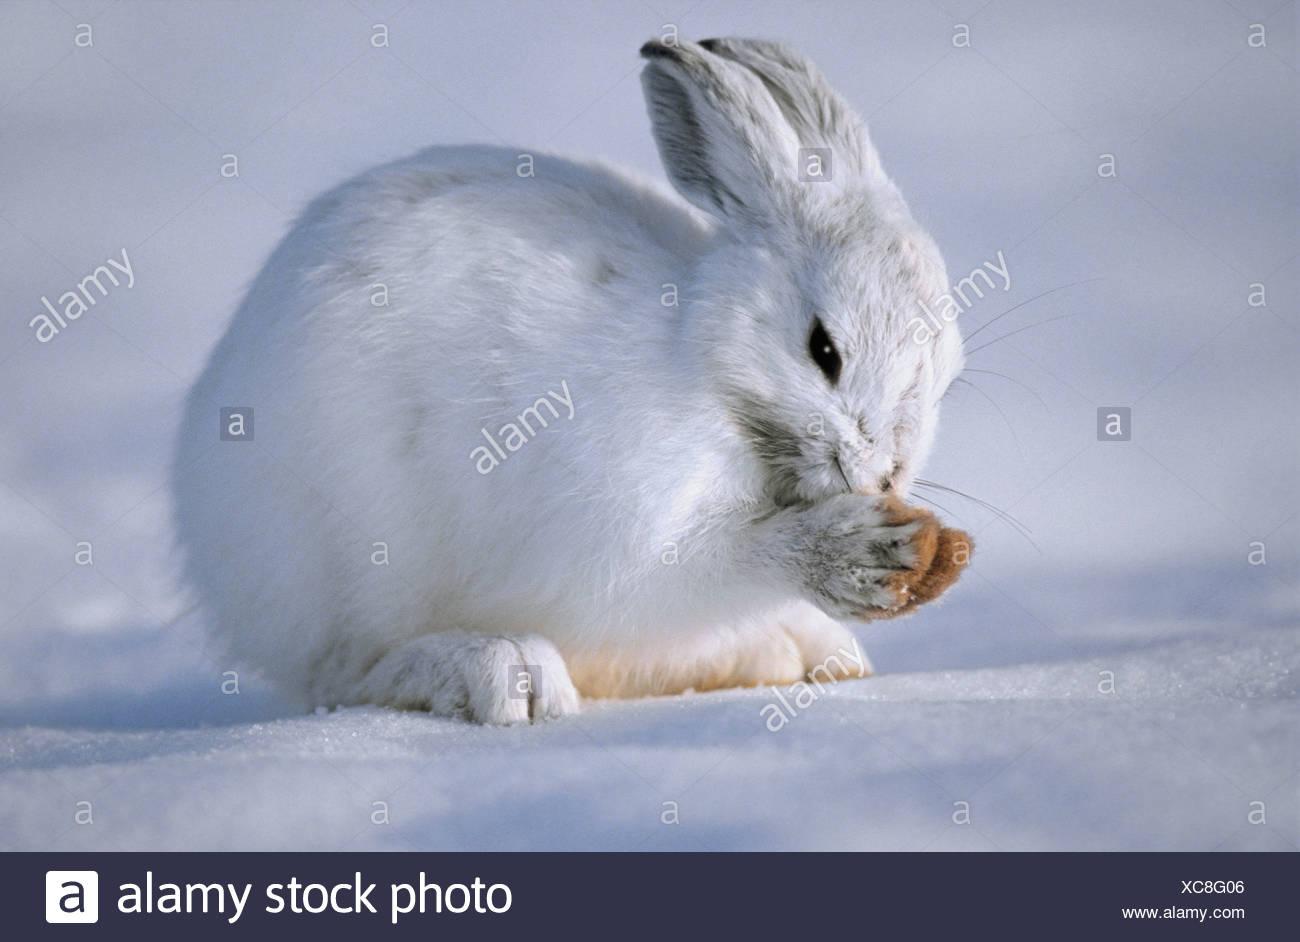 Tk0586, Thomas Kitchin; Snowshoe Hare In Winter Coat. Camouflage In Snow. North America. Lepus Americanus. - Stock Image